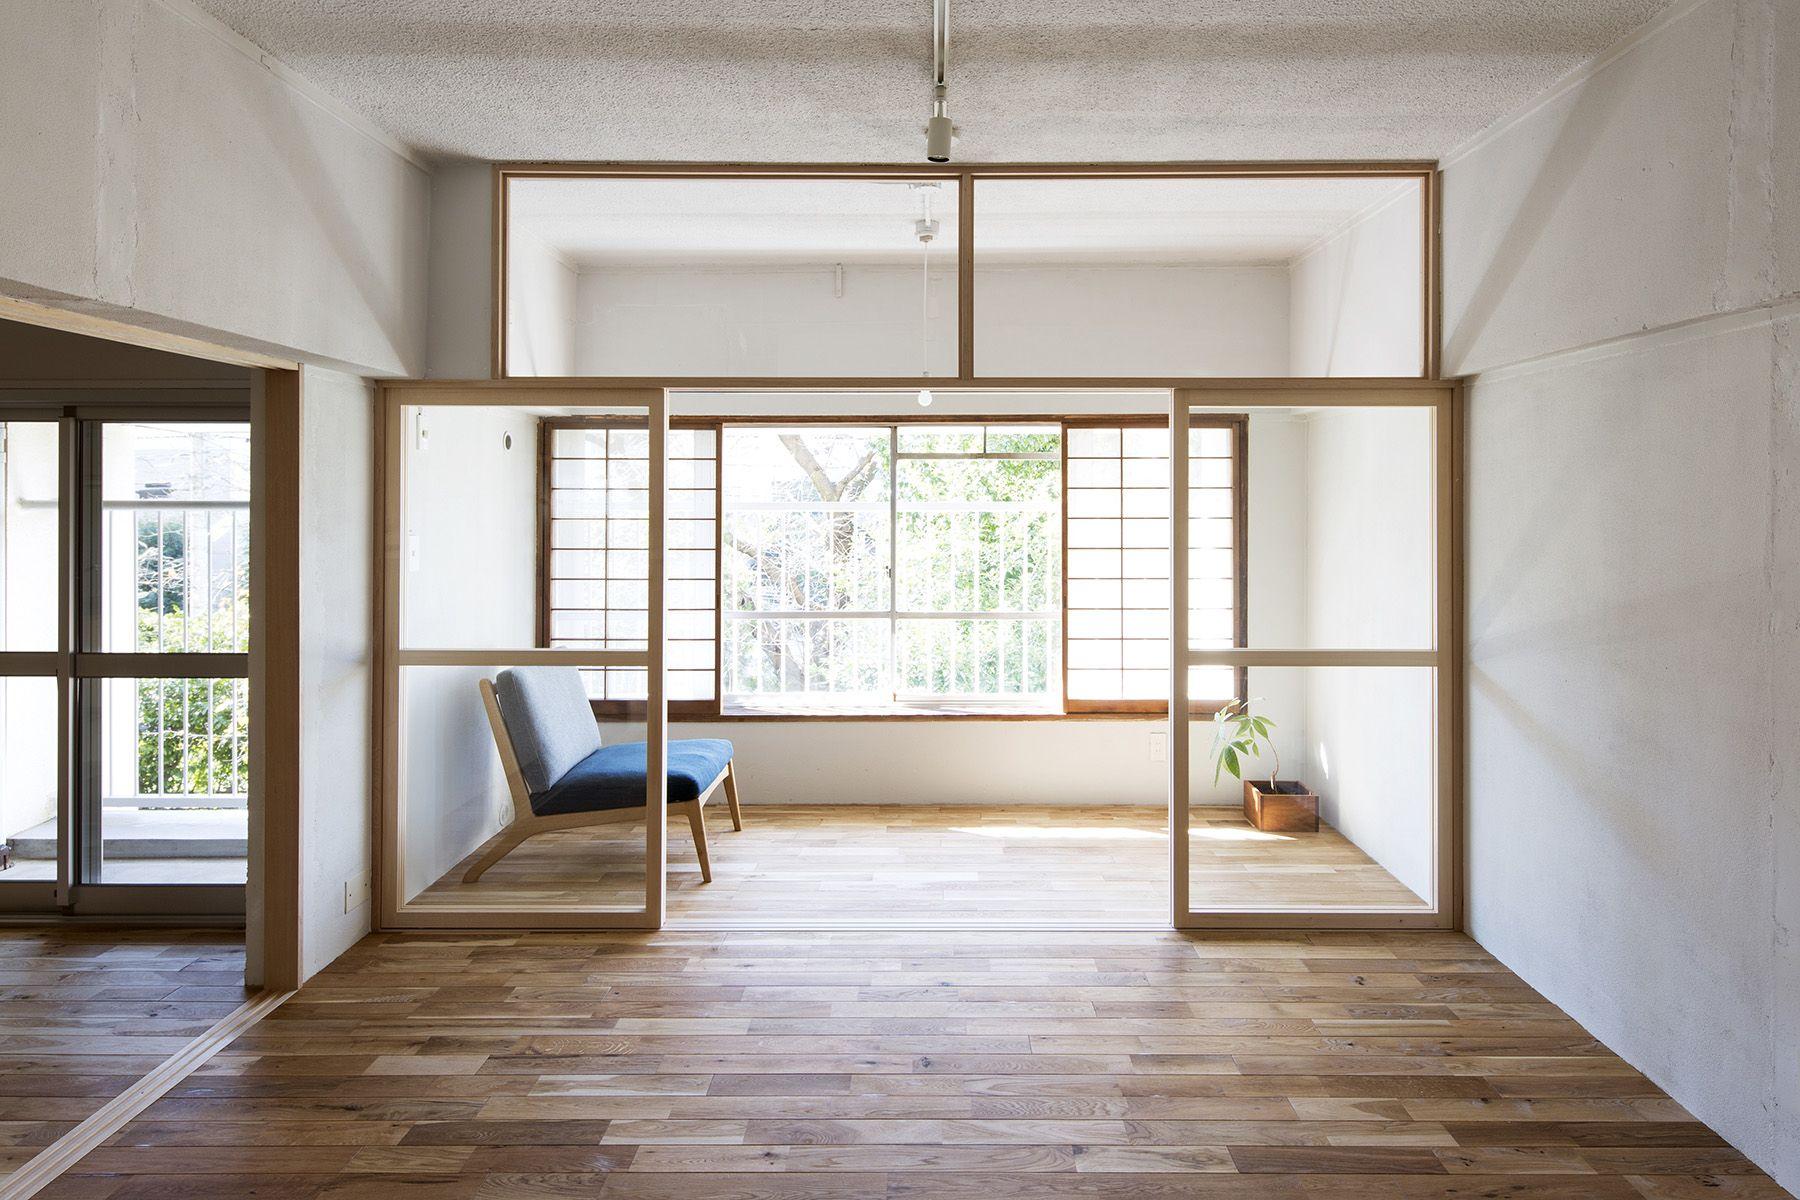 Camp Design: House in Roka-koen — Thisispaper — What we save, saves ...